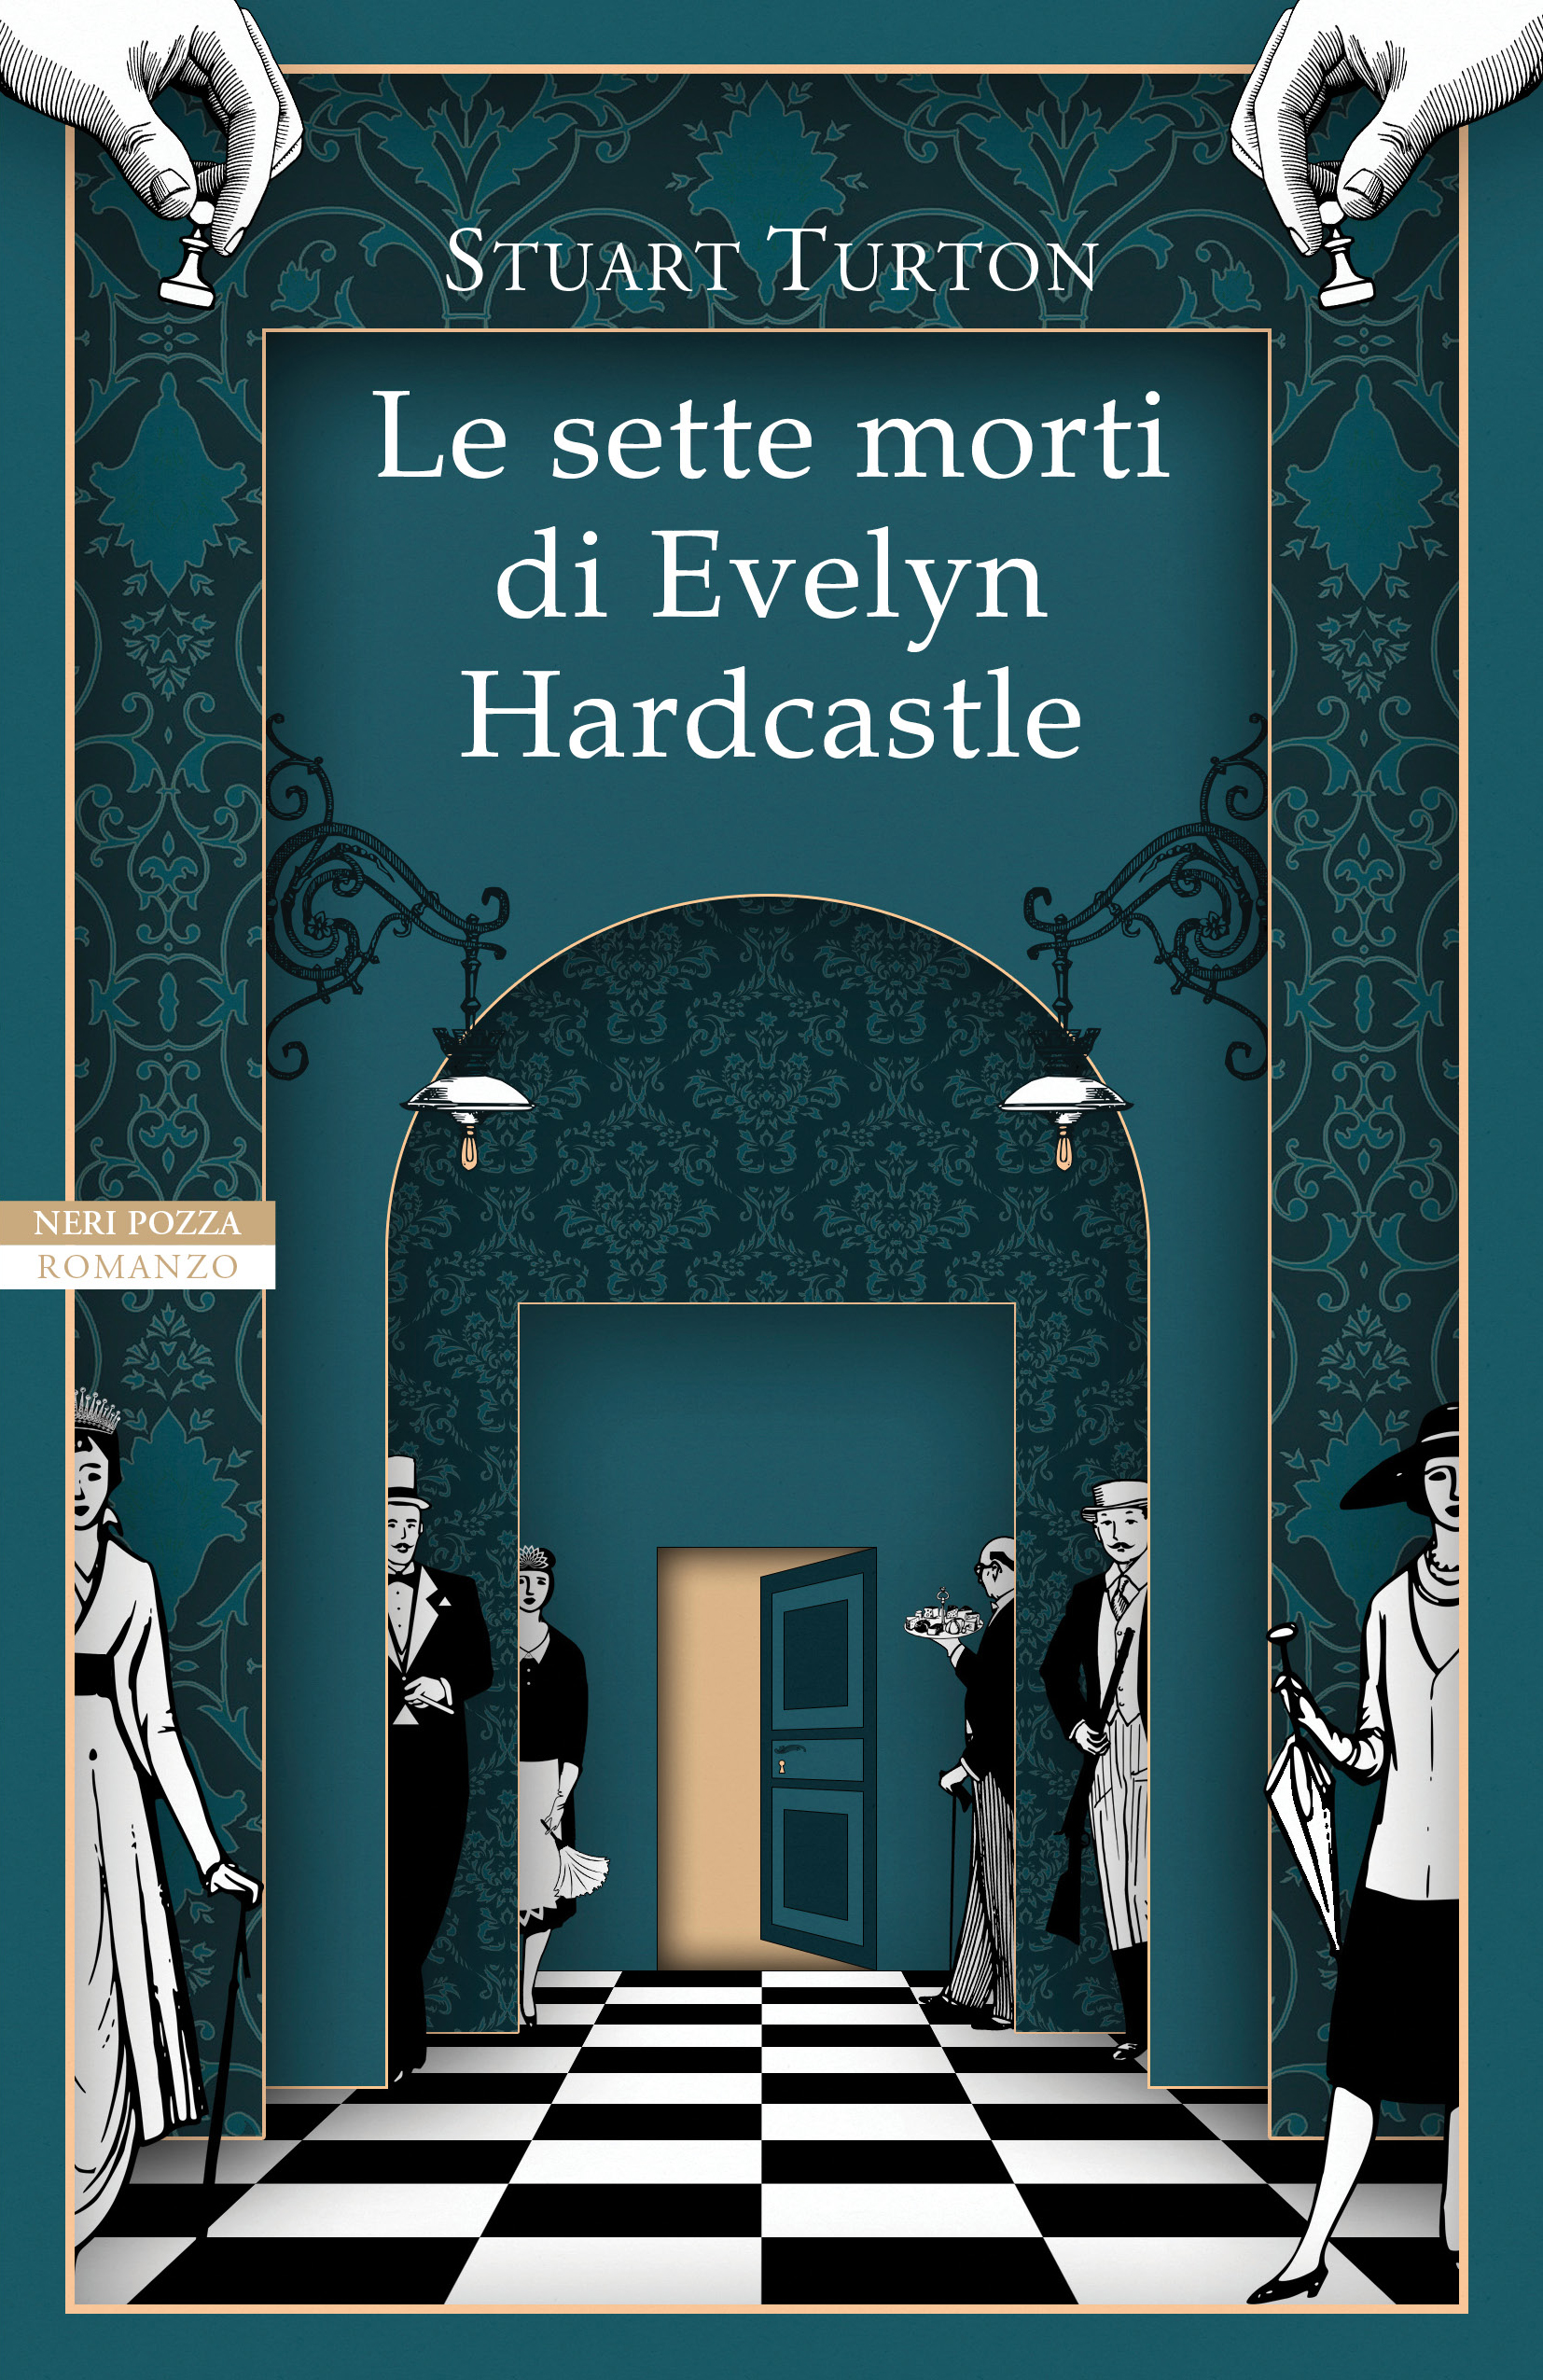 Le sette morti di Evelyn Hardcastle by Stuart Turton